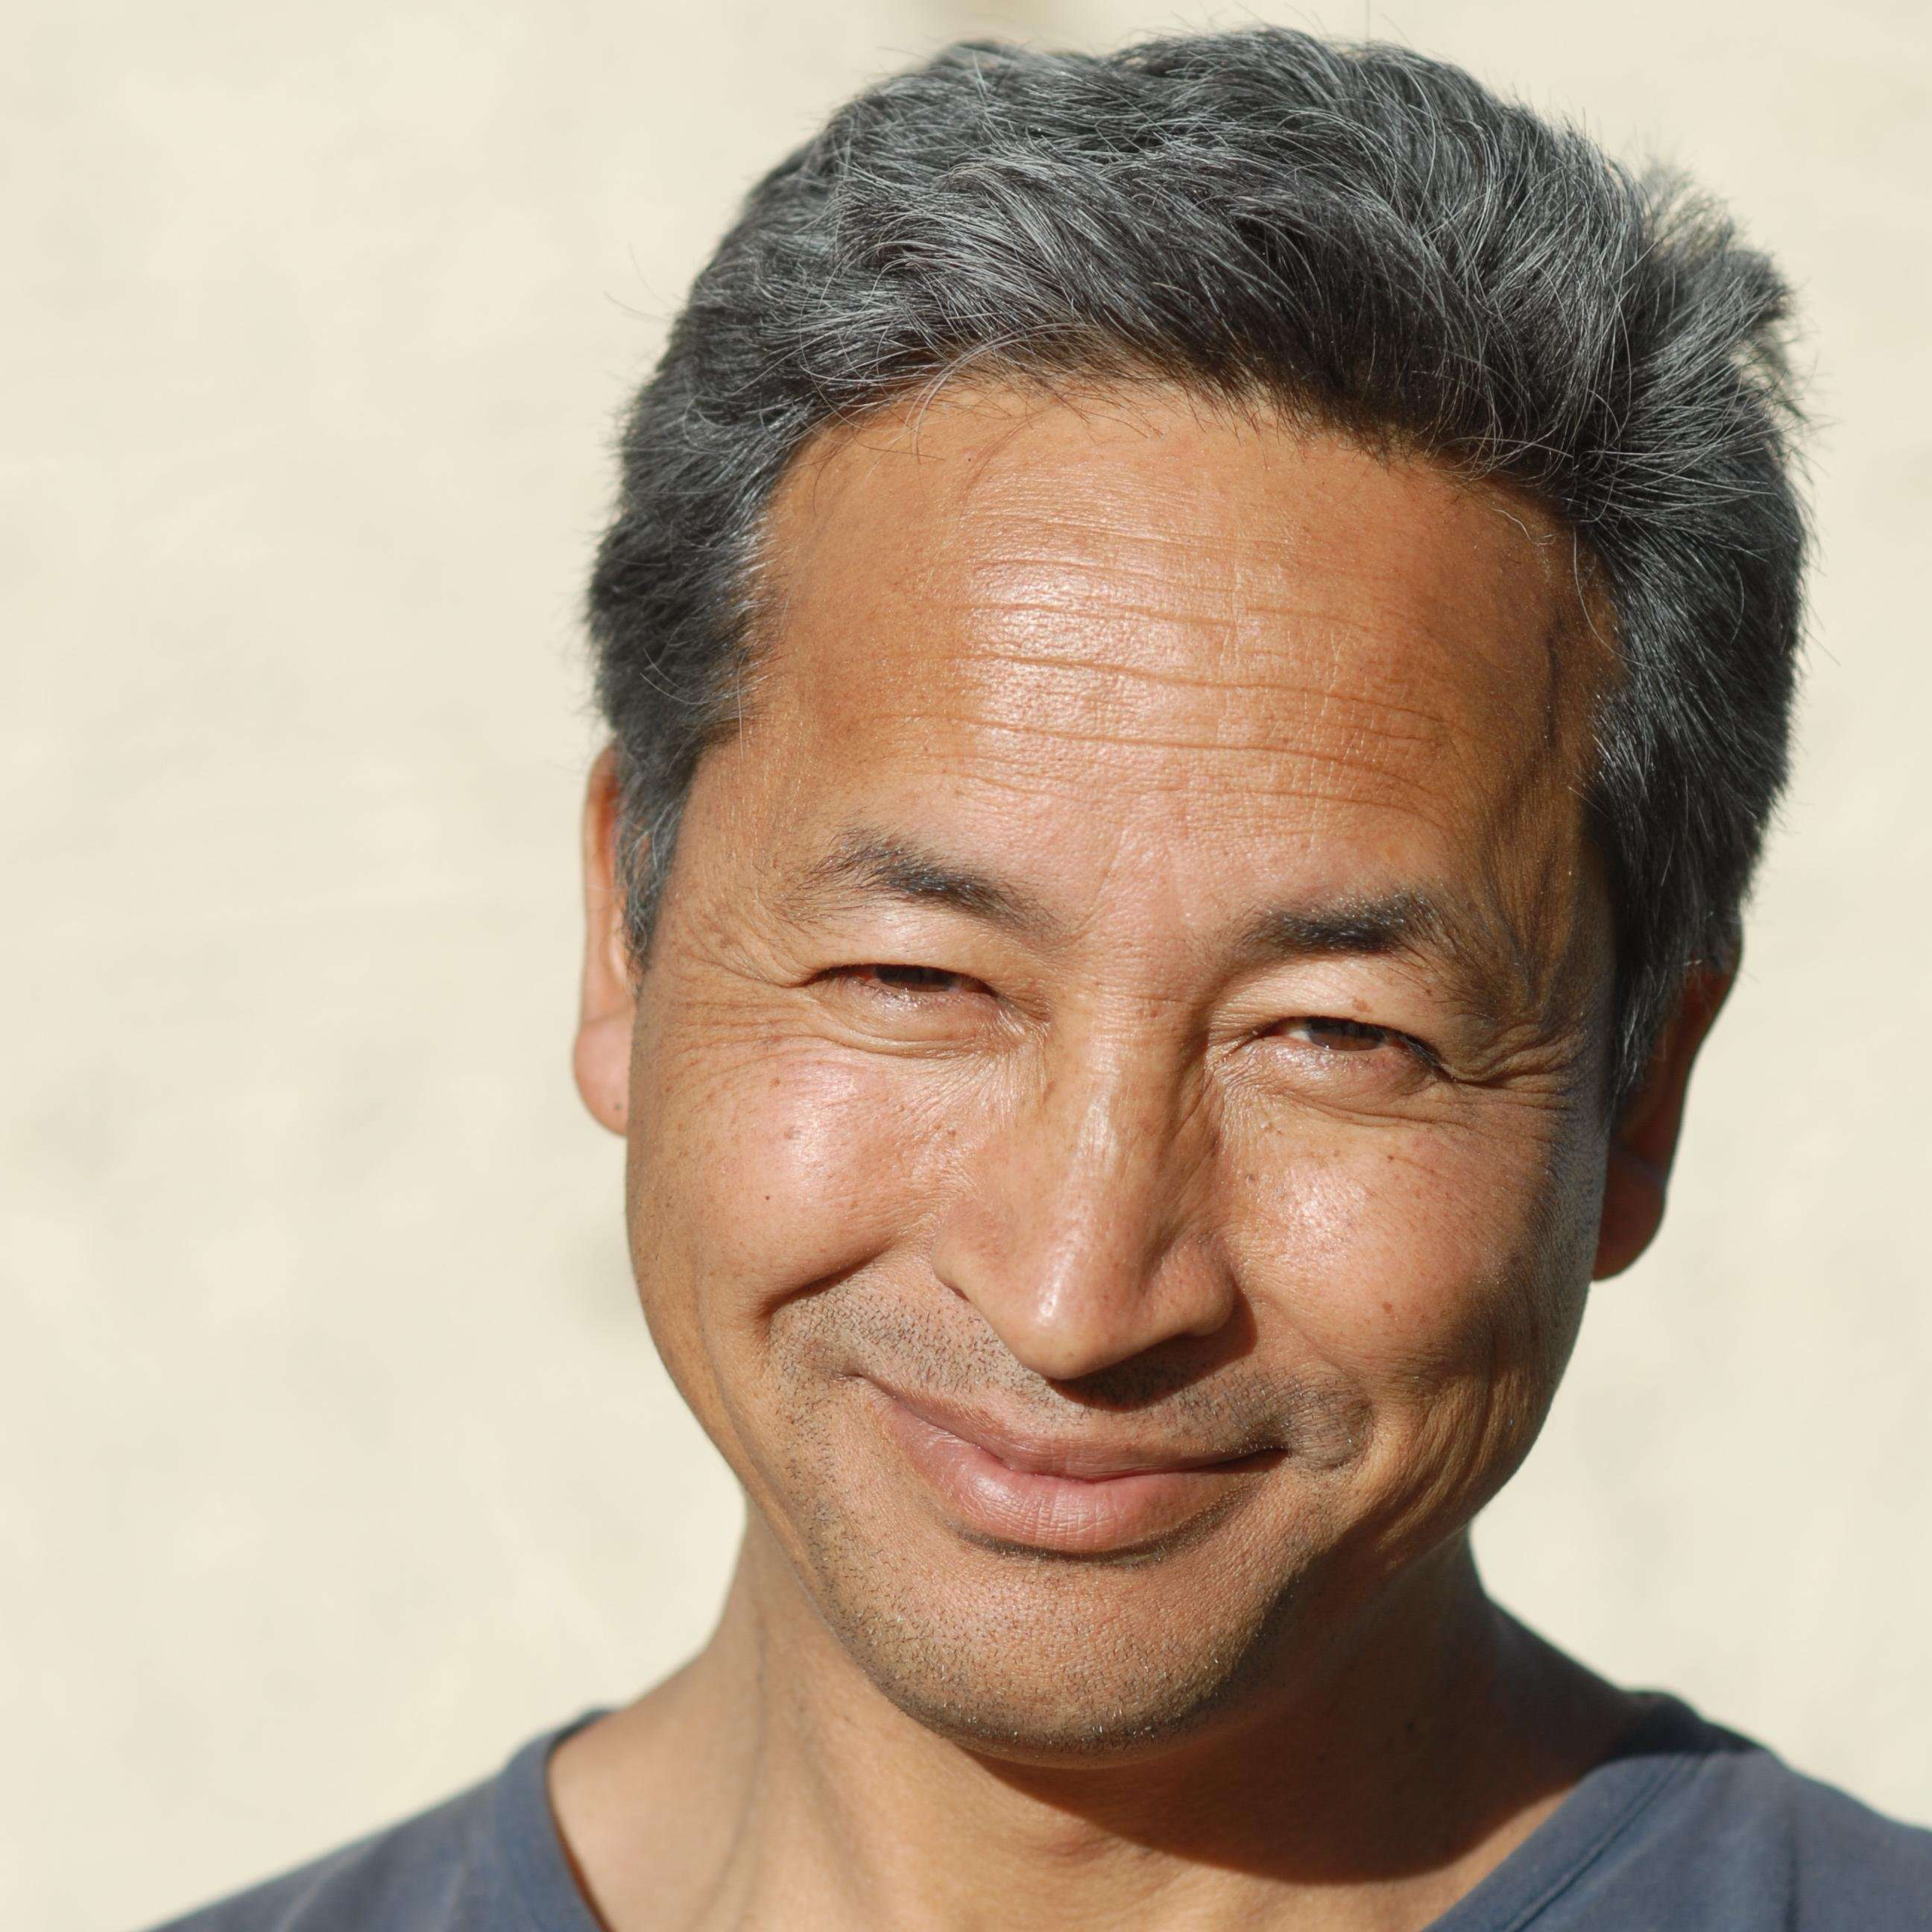 meet sonam wangchuk, the 50 year old innovator from ladakh